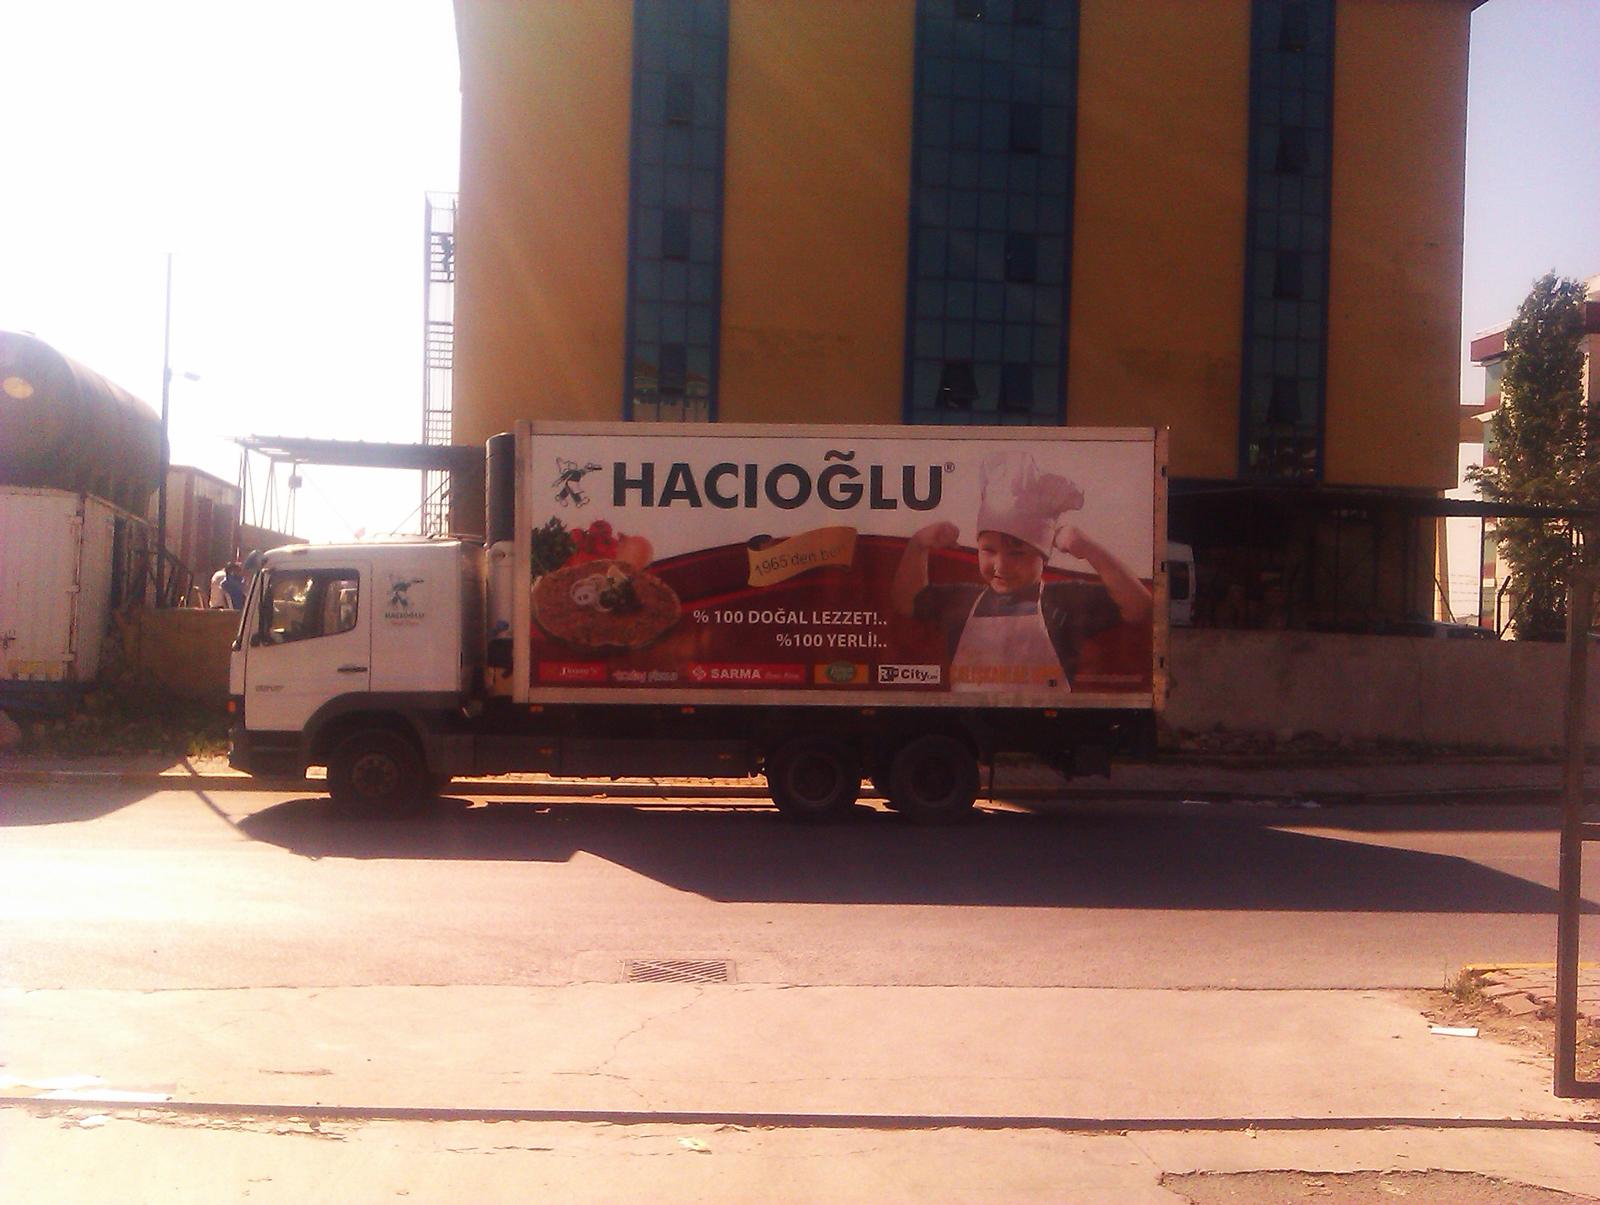 hacioglu-3-arac-giydirme